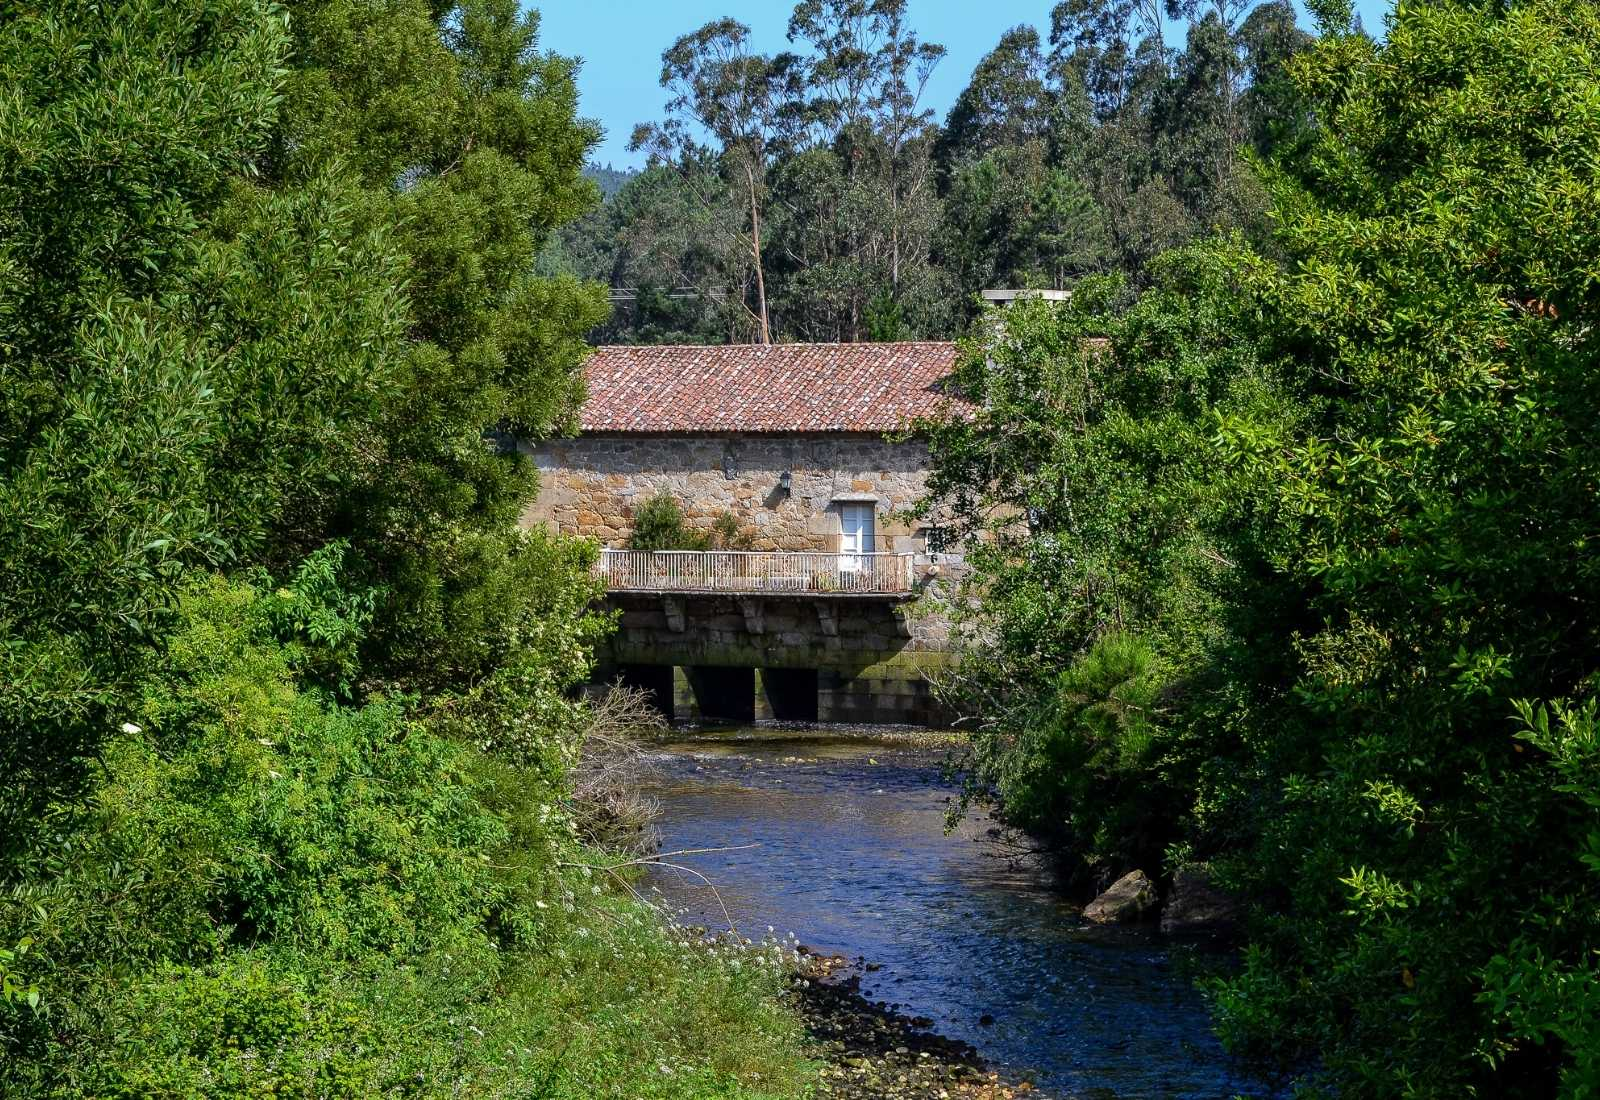 Camino de los faros Ponte do Porto